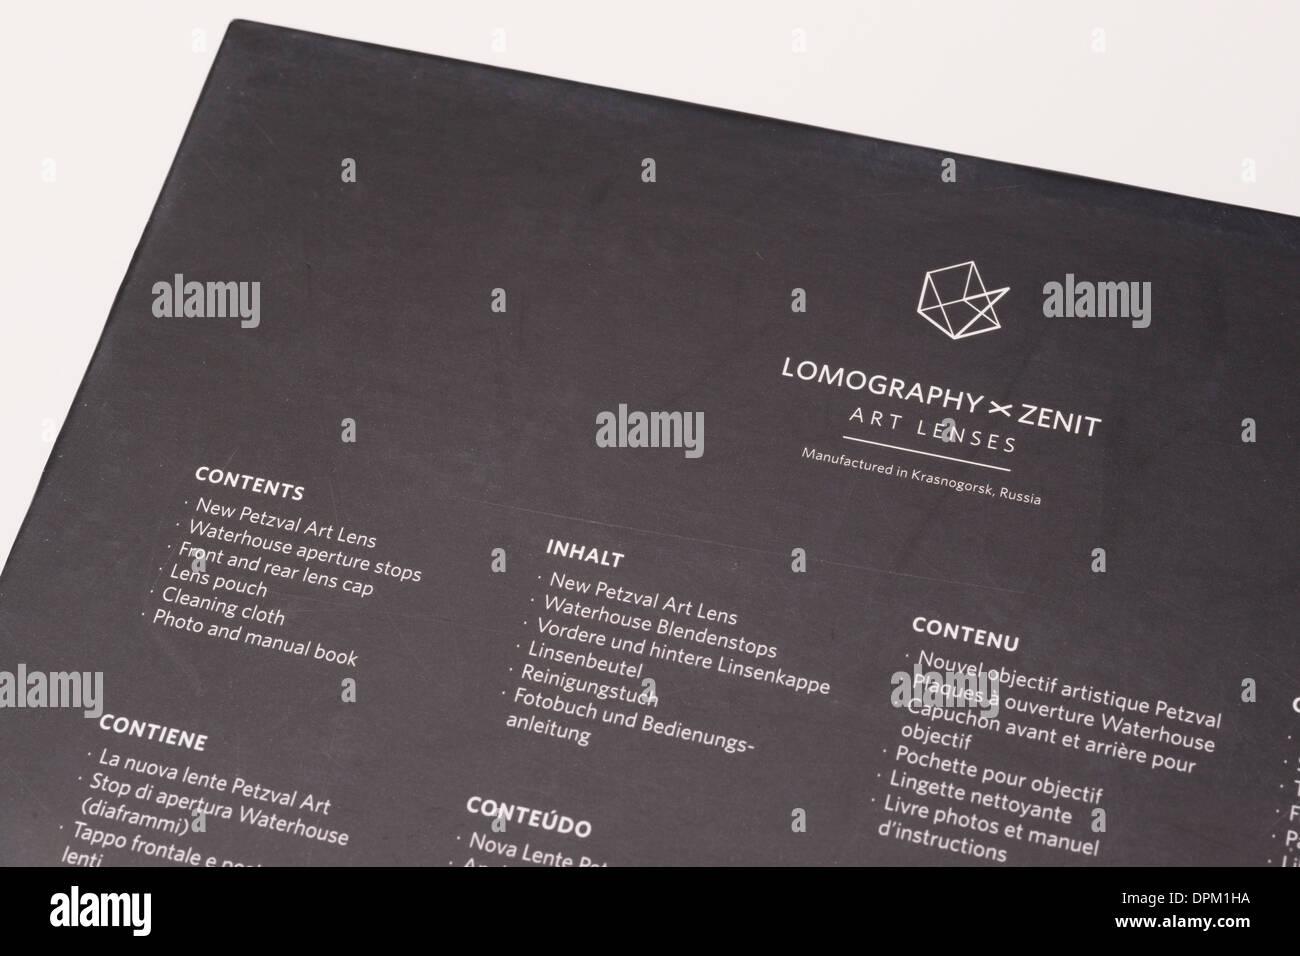 2005a66233 Información del cuadro de lentes Petzval, Lomography Project - internet  Kickstarter producción financiado por pedidos. Réplica de 1840 lente.